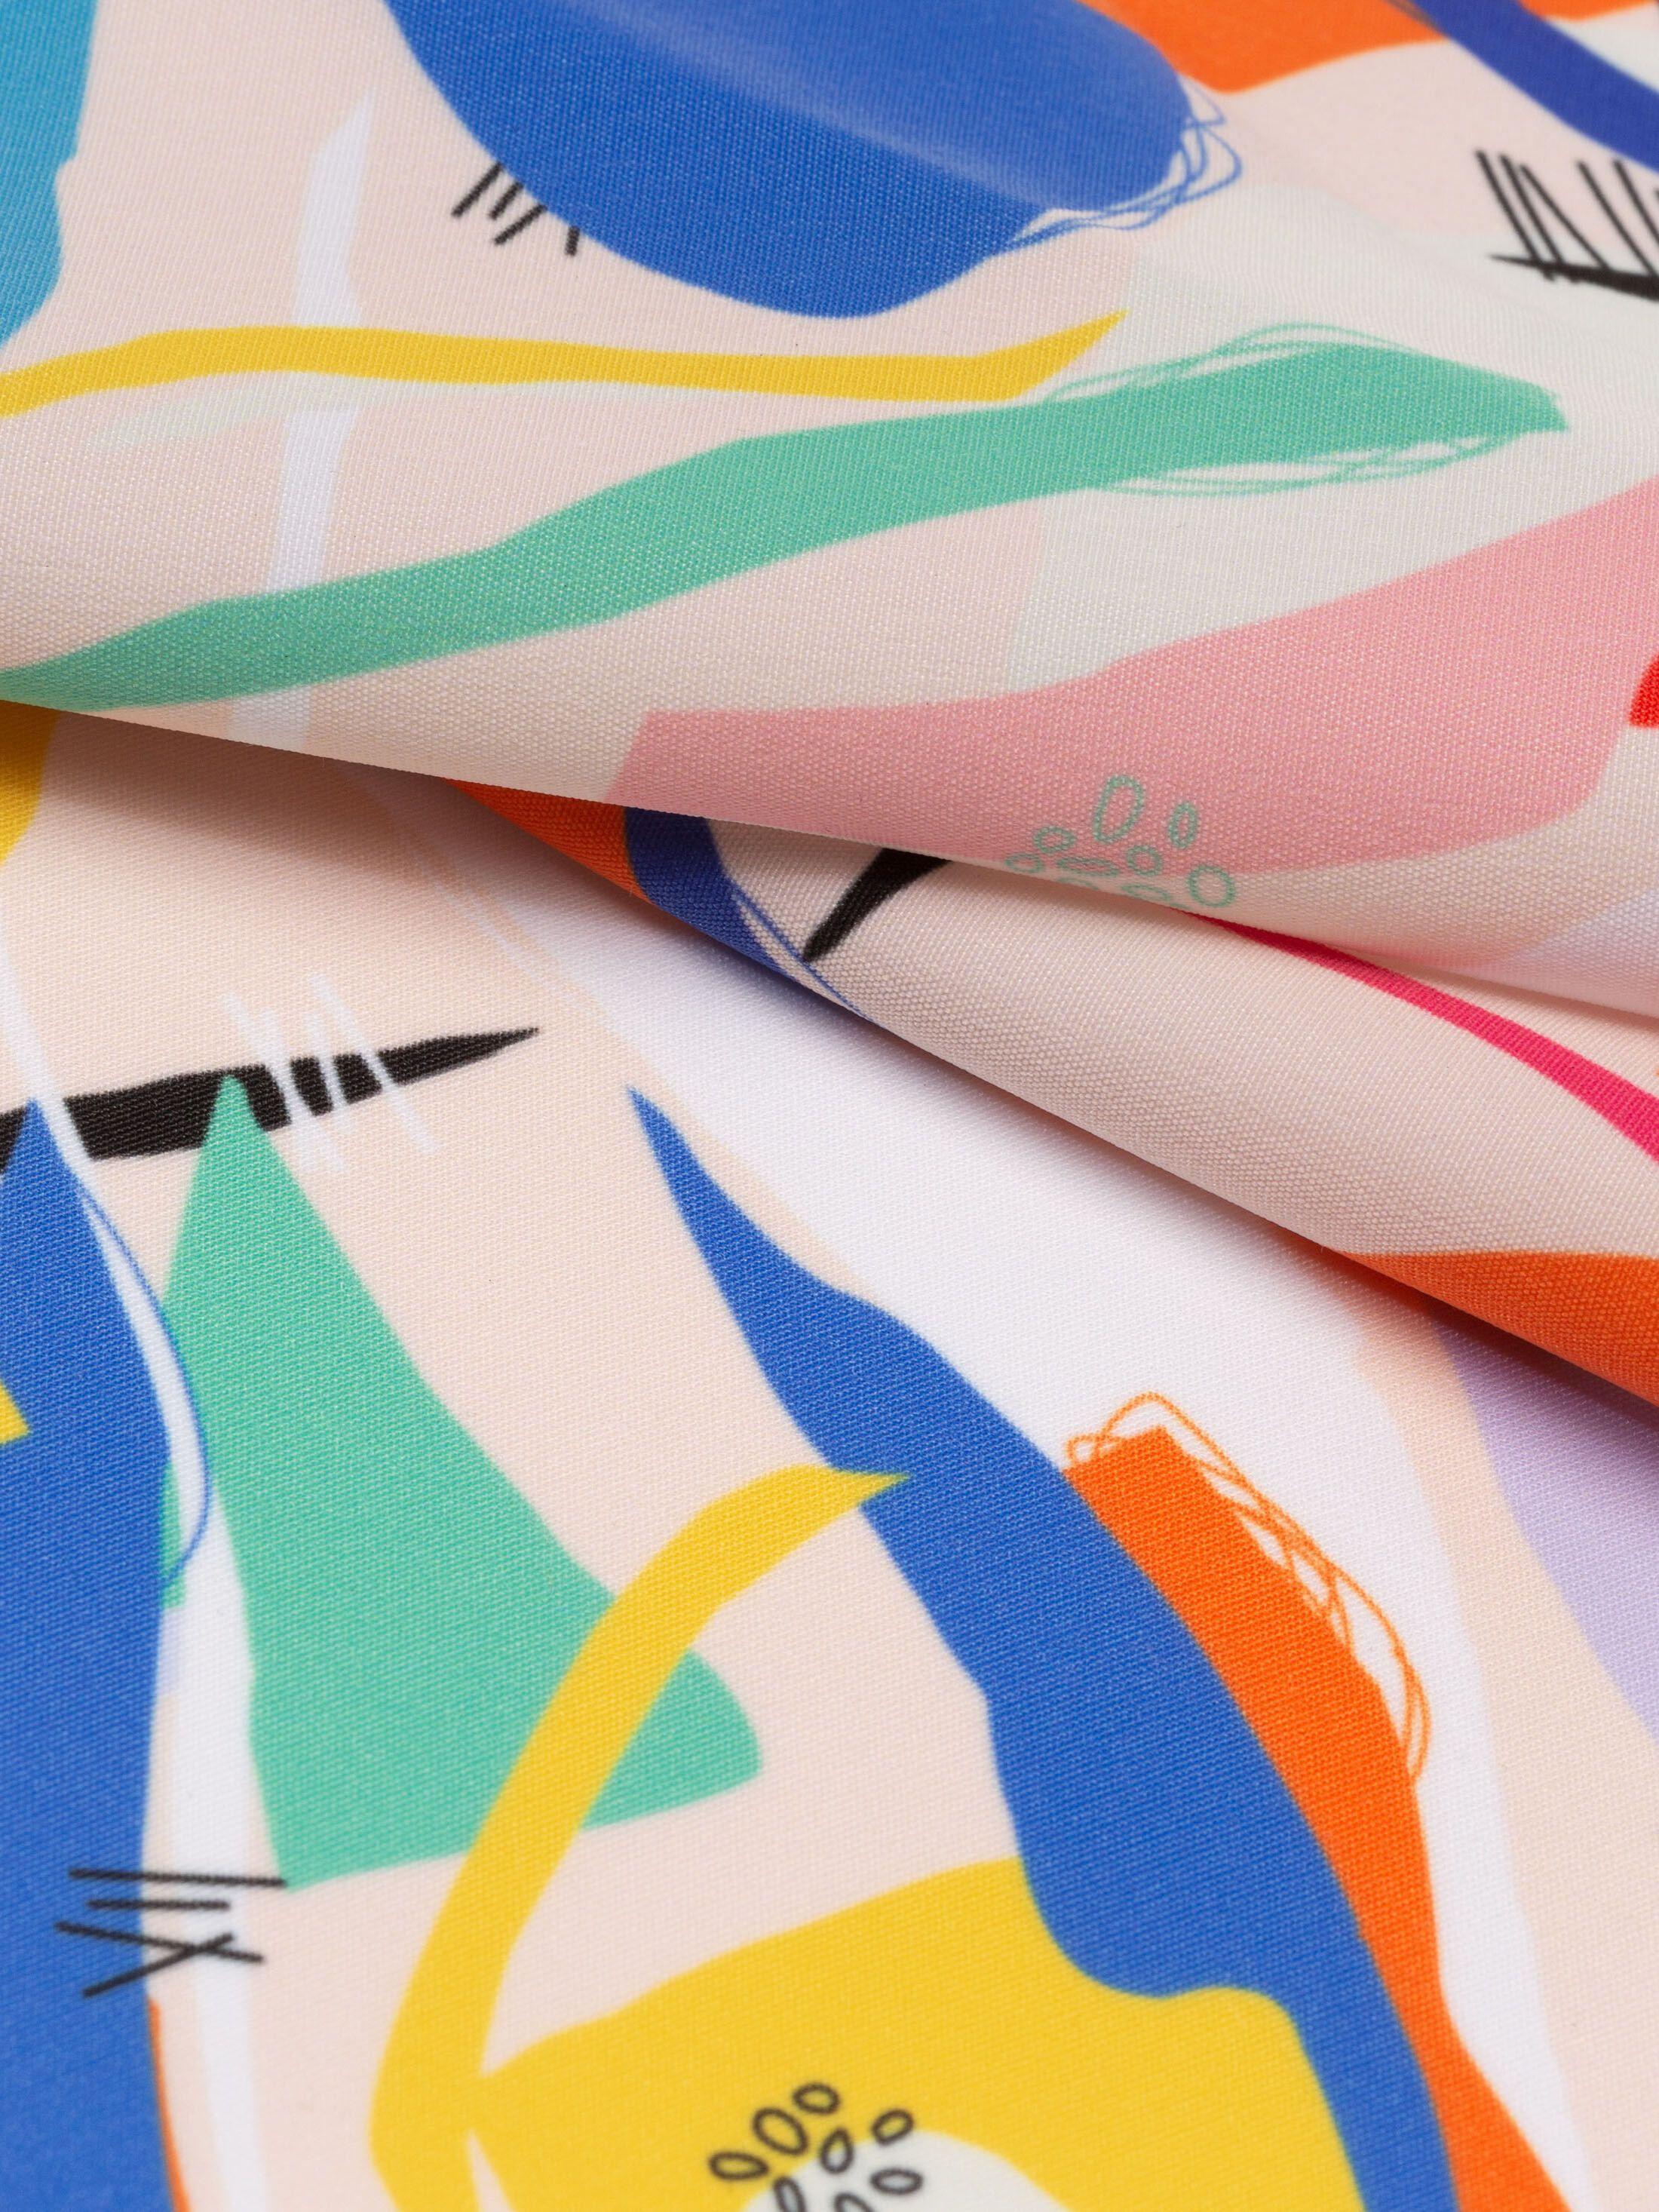 custom peach Poly fabric printing creased